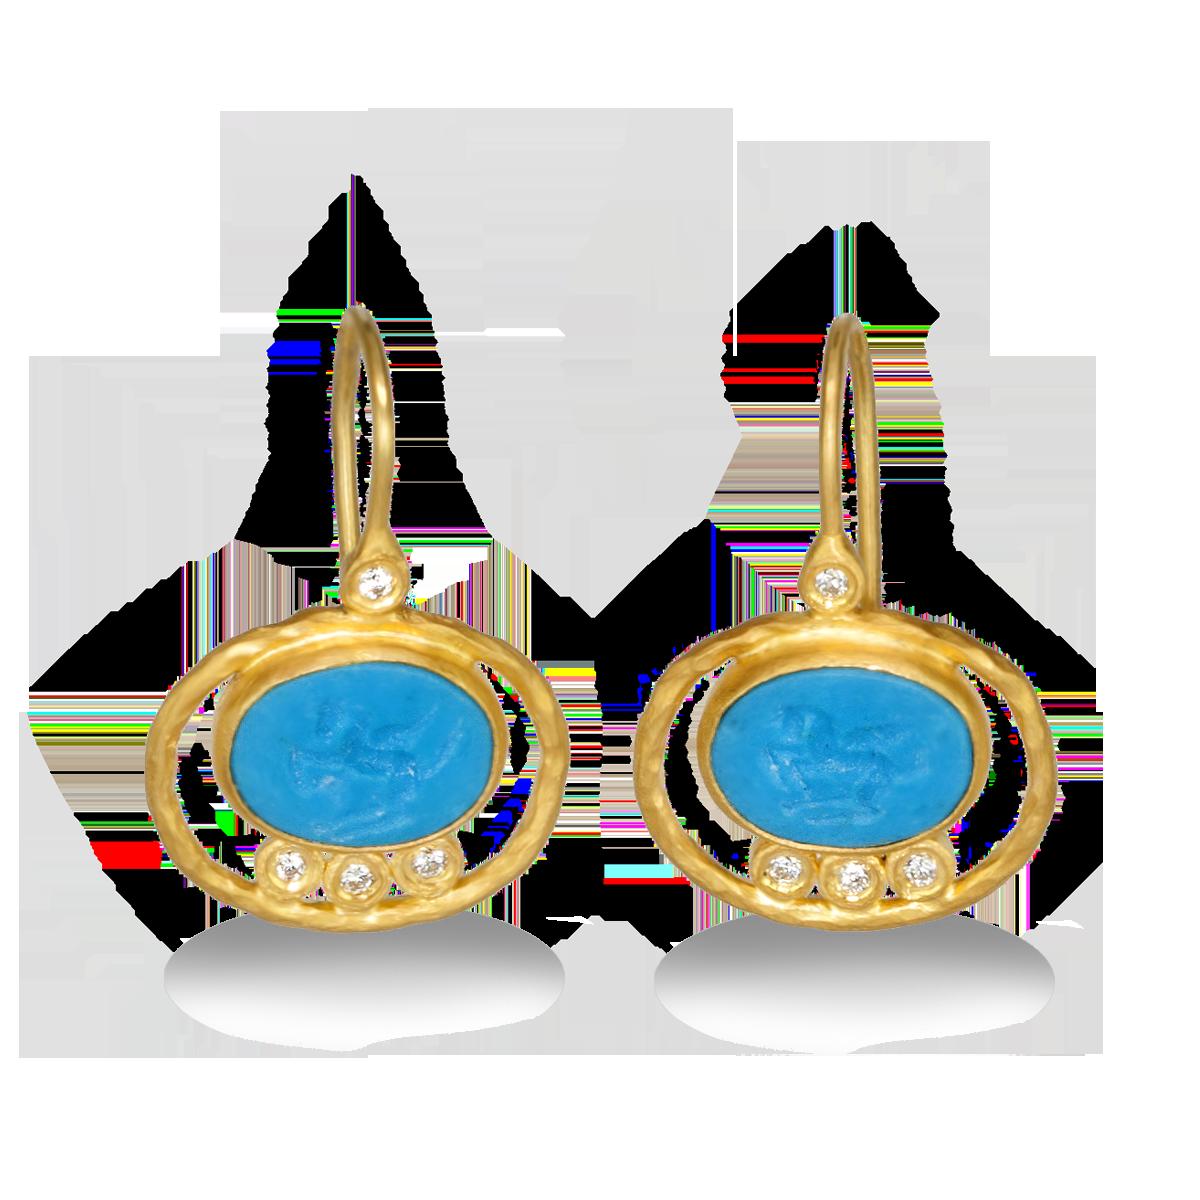 Kurtulan 24k Gold And Sleeping Beauty Turquoise French Hook Earrings